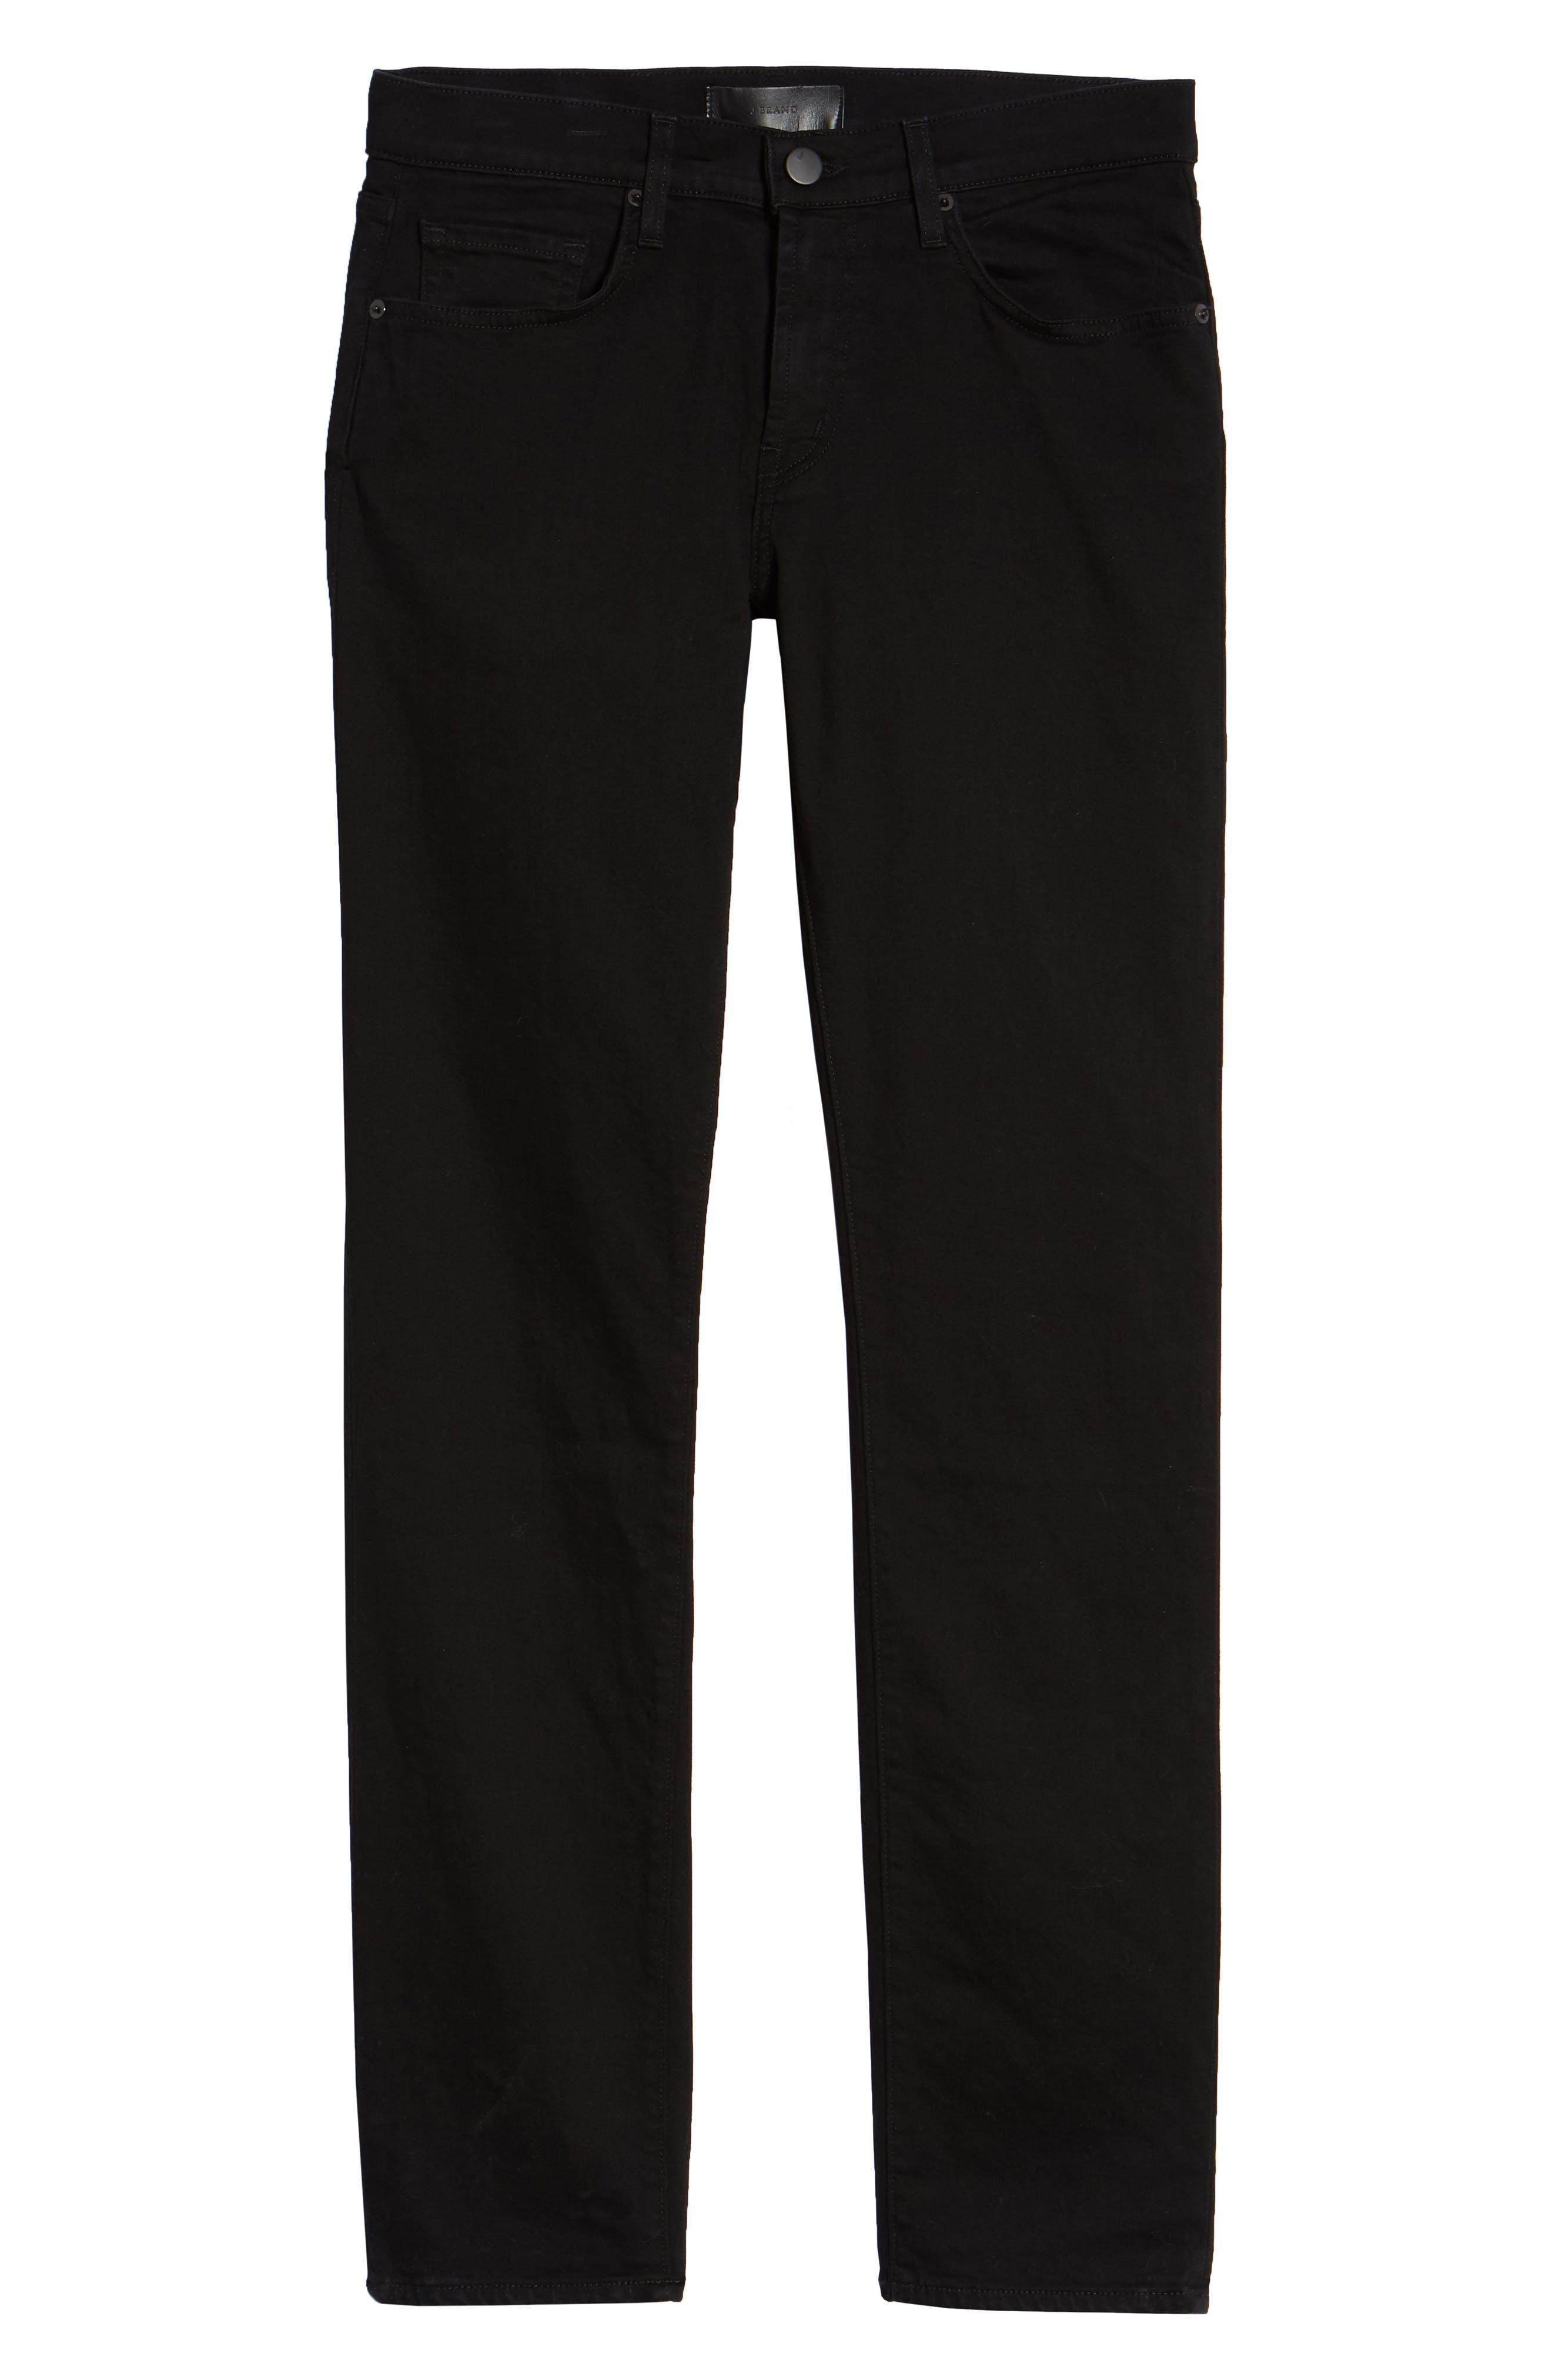 J BRAND, Tyler Slim Fit Jeans, Alternate thumbnail 2, color, TRIVOR BLACK